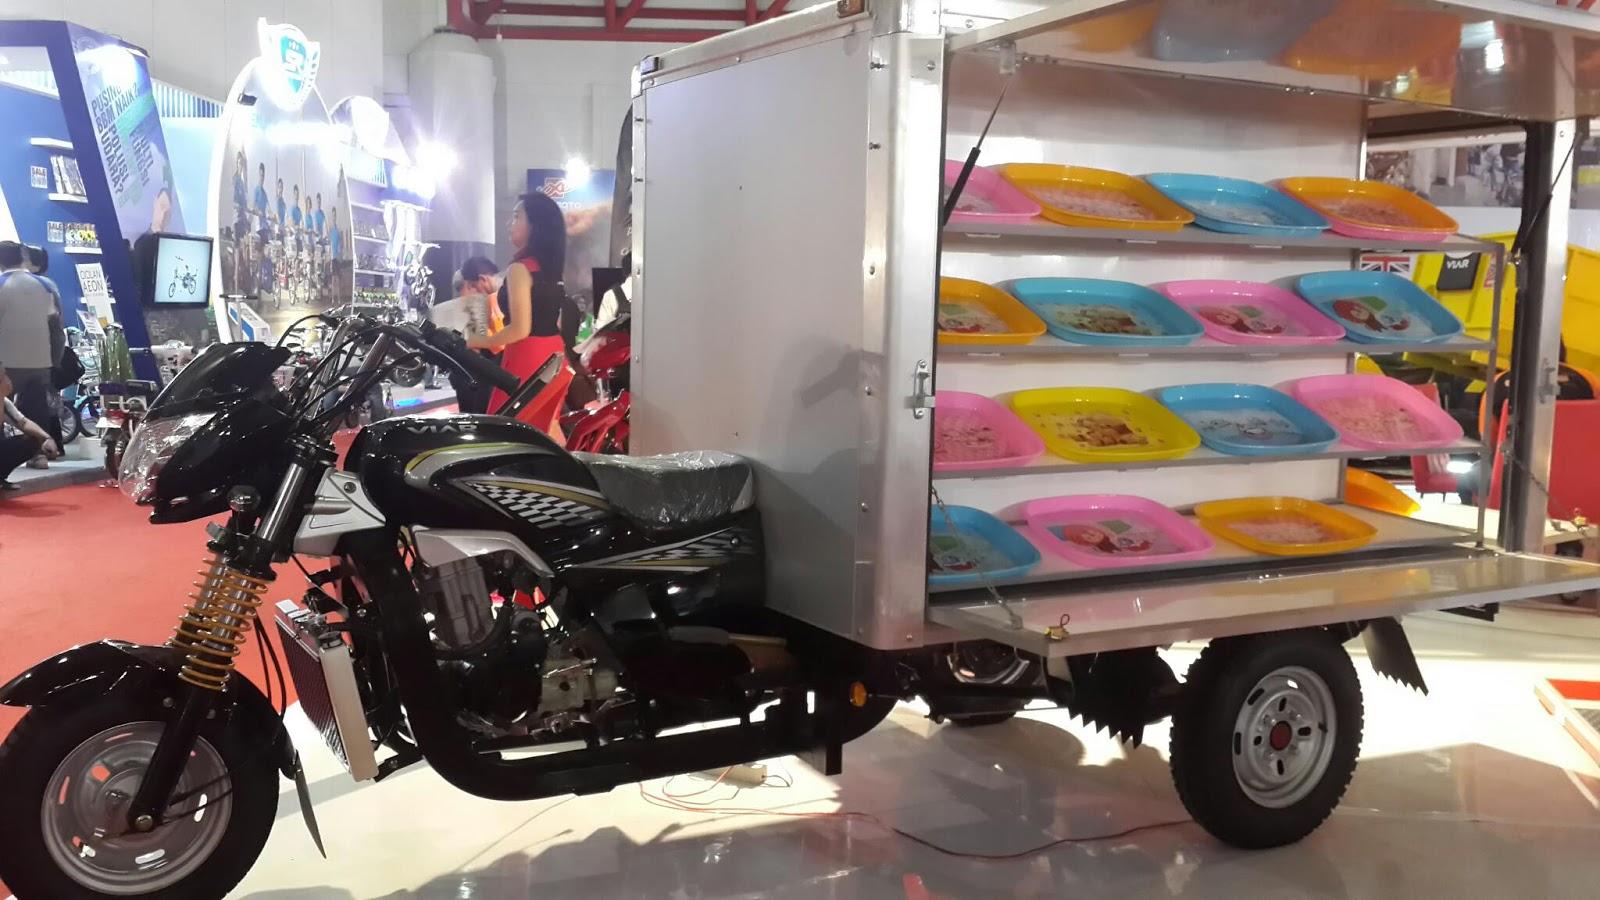 98 Modifikasi Motor Untuk Jualan Terbaru Oneng Motomania Kaisar Triseda Rx 250 Cc Long Box Viar Lovers Juni 2015